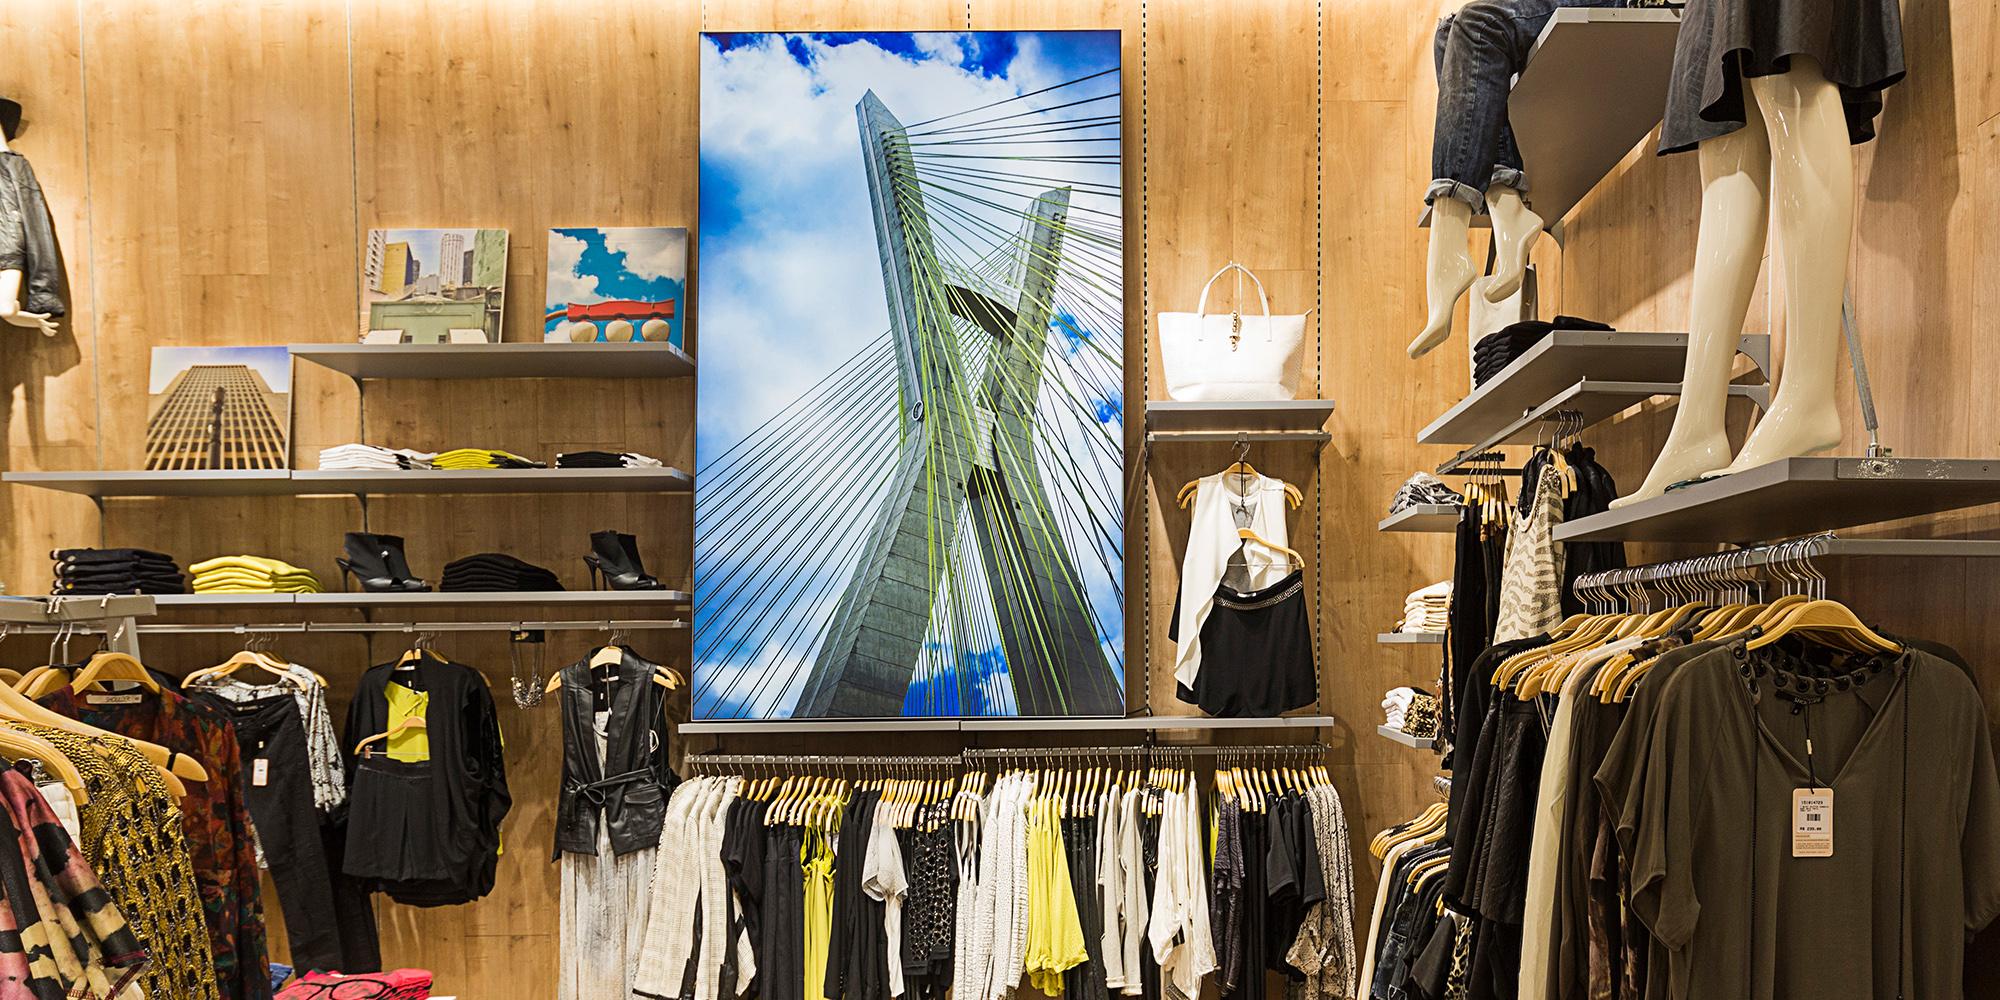 senfa visual communication lightboxe backlit fabrics pearl sublimis altimis alterra